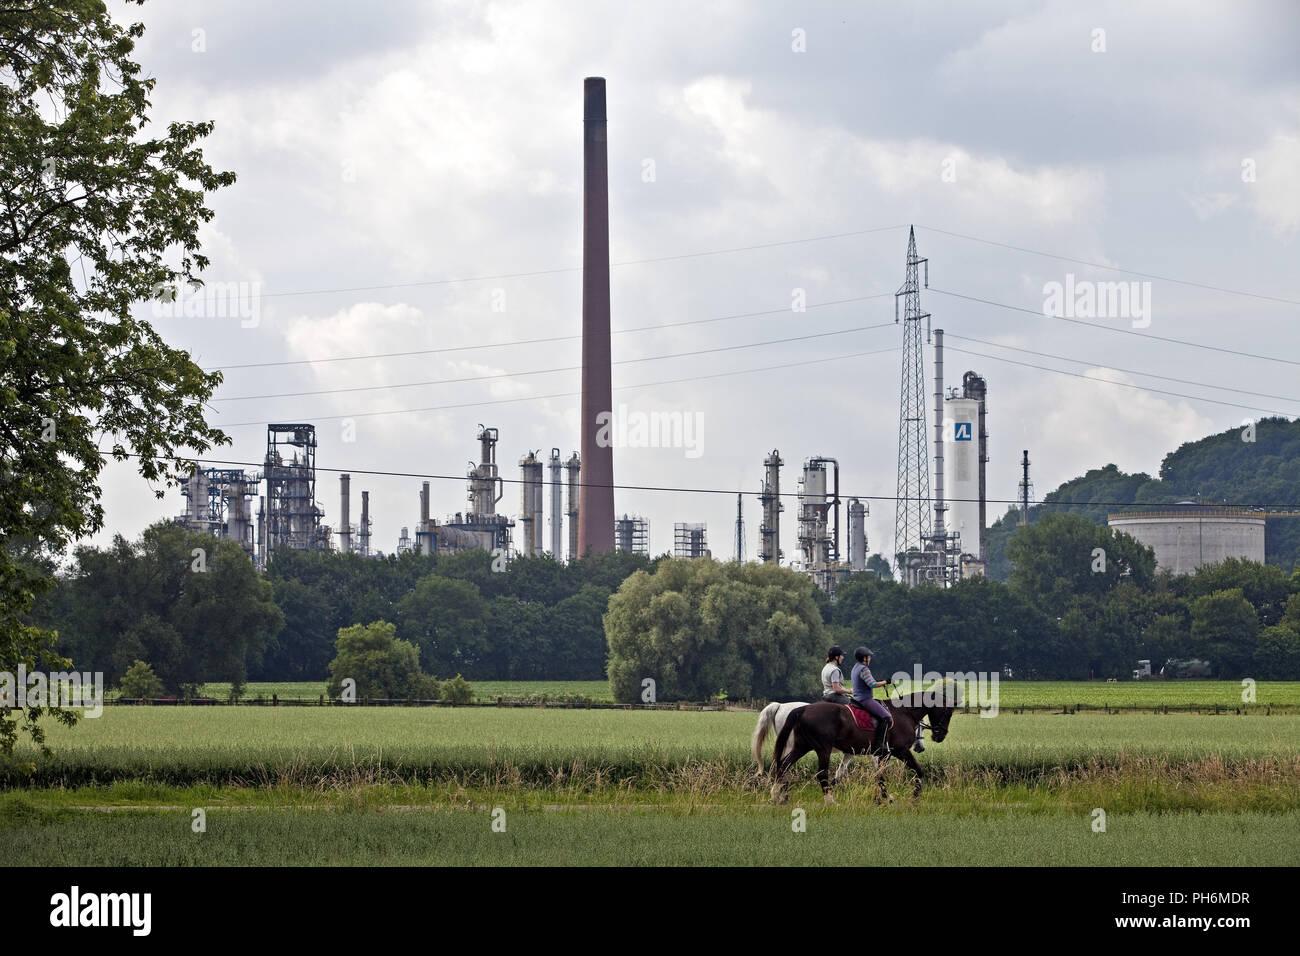 Rider en face de l'industrie, Gelsenkirchen, Allemagne Photo Stock